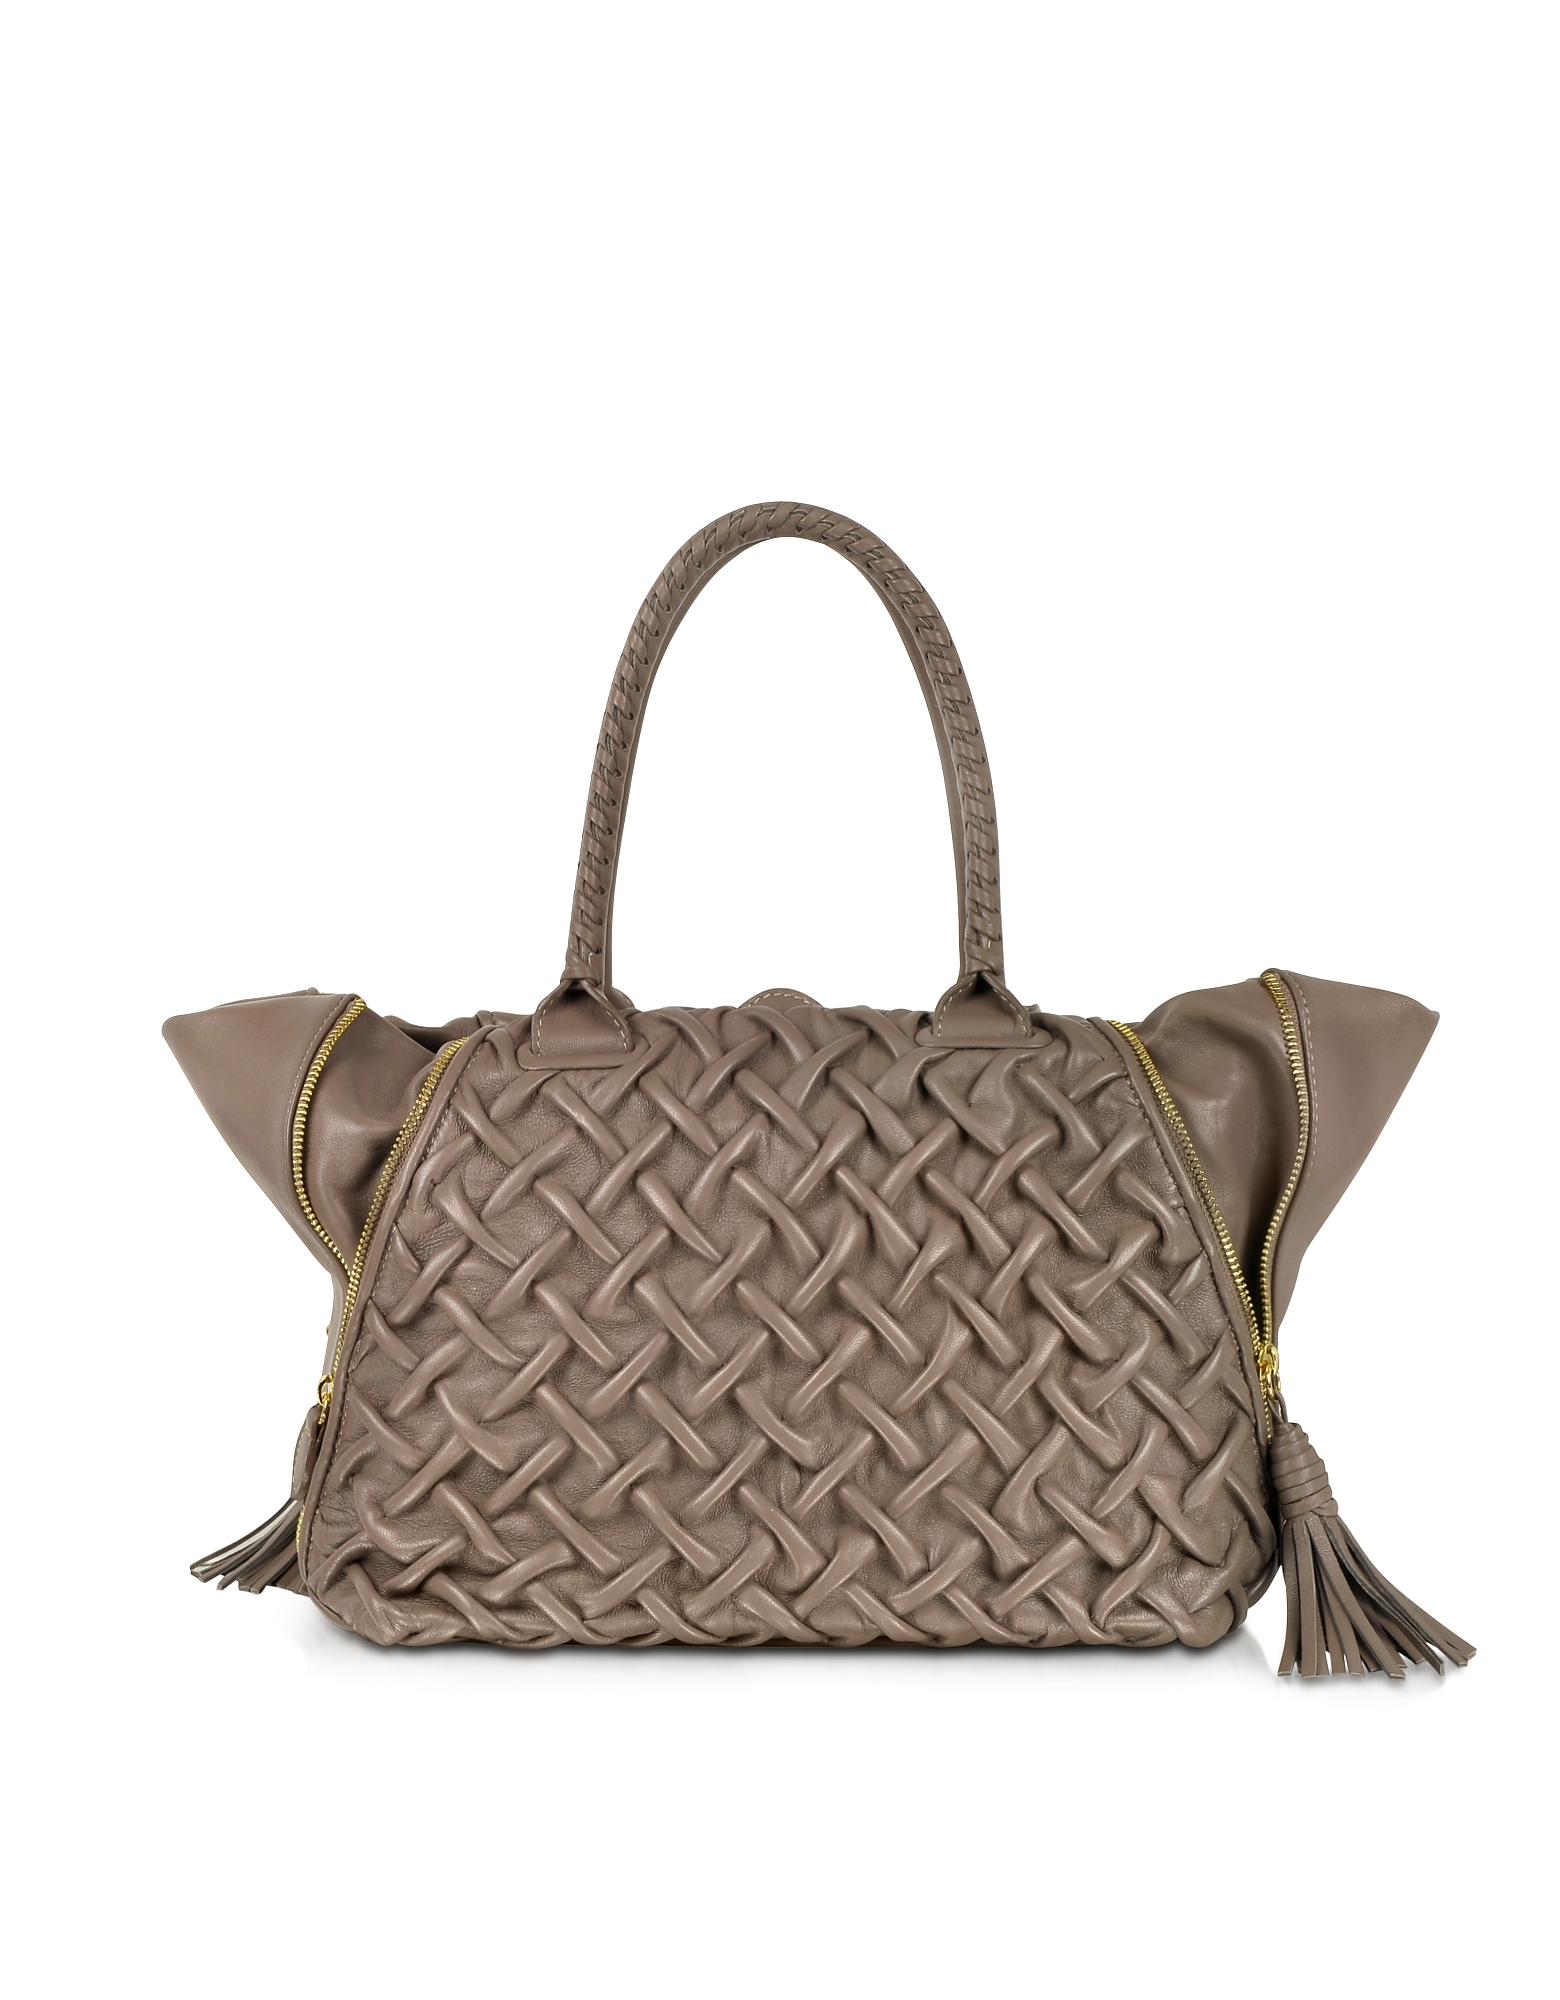 Forzieri Handbags, Taupe Pleated Leather Tote